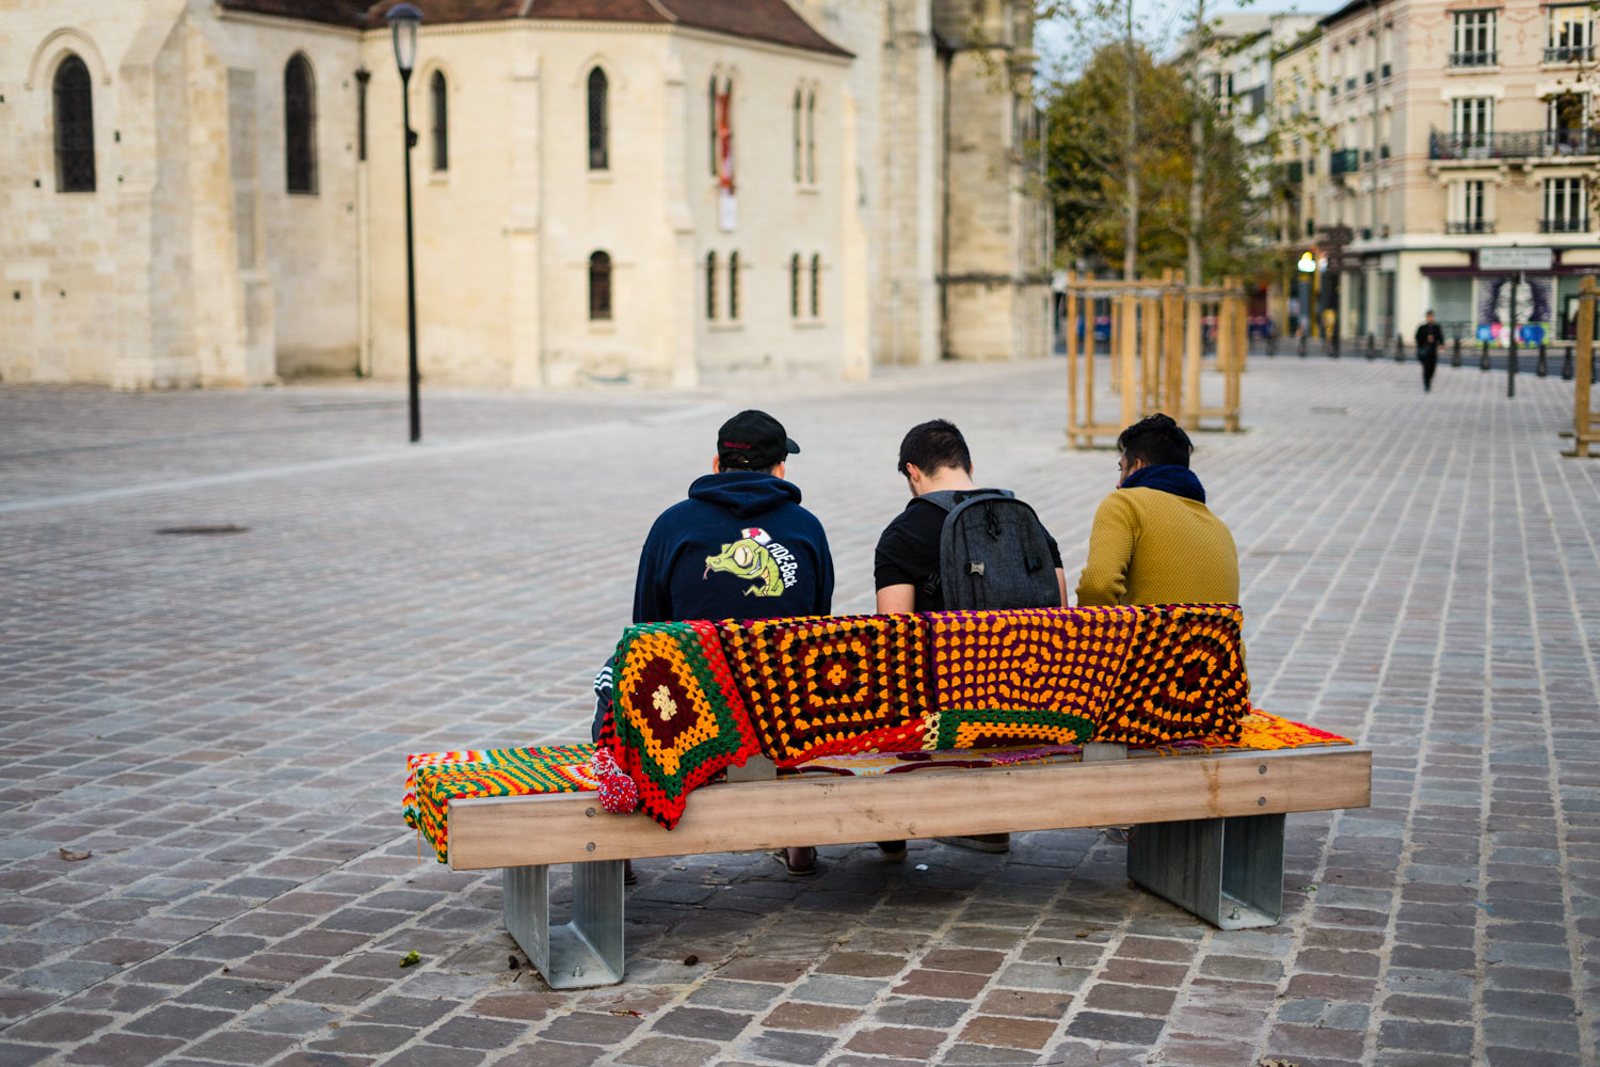 street art vitry-sur-seine, street art vitry, street art val-de-marne, street art banlieue paris, art urbain vitry, art urbain vitry-sur-seine, art urbain vitry, le guide du street art à paris, stéphanie lombard, yarm bombing, tricot urbain